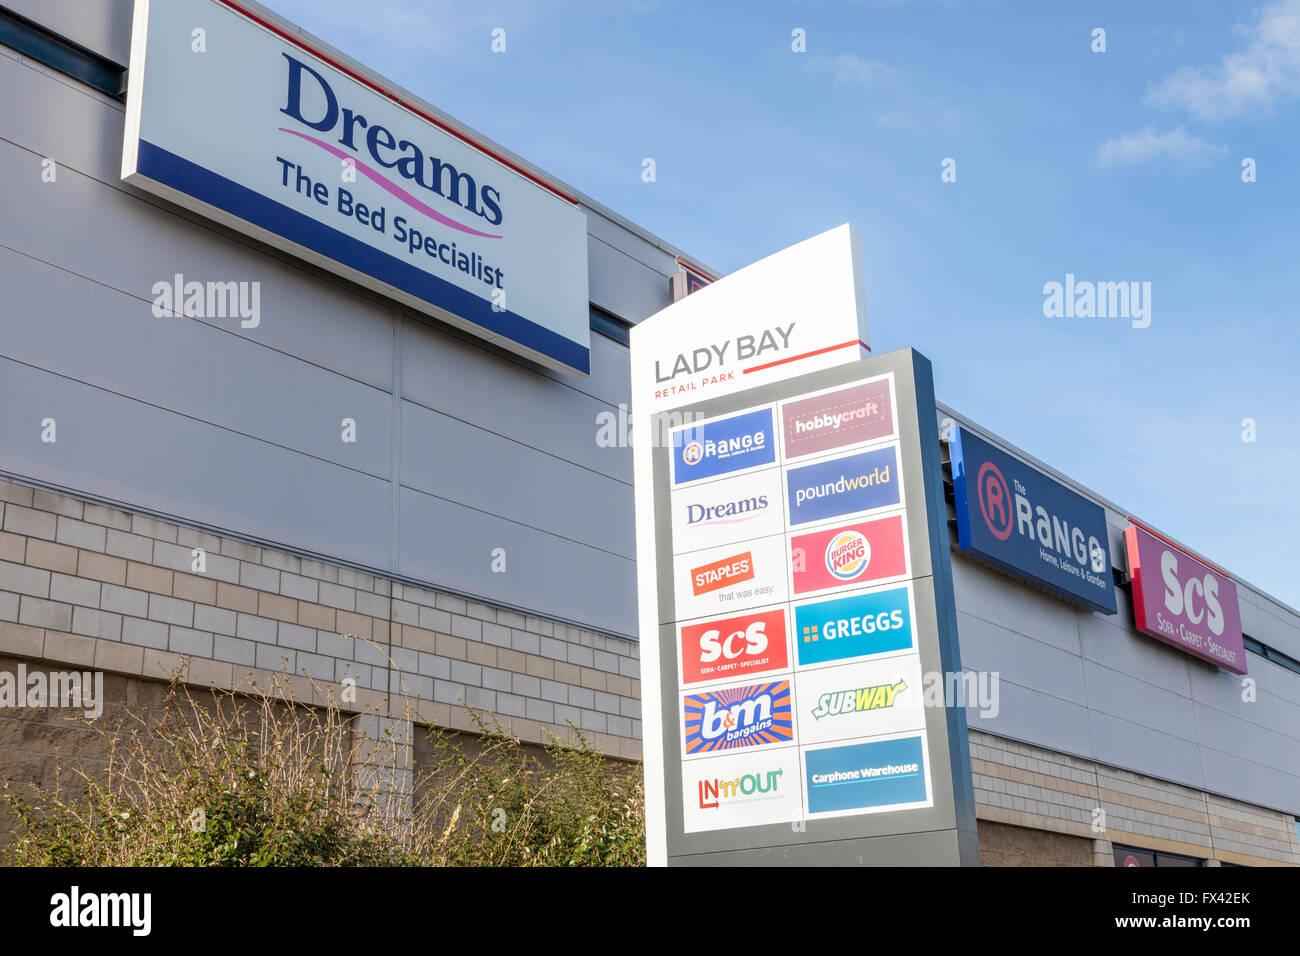 Signs at Lady Bay Retail Park, Nottingham, England, UK - Stock Image